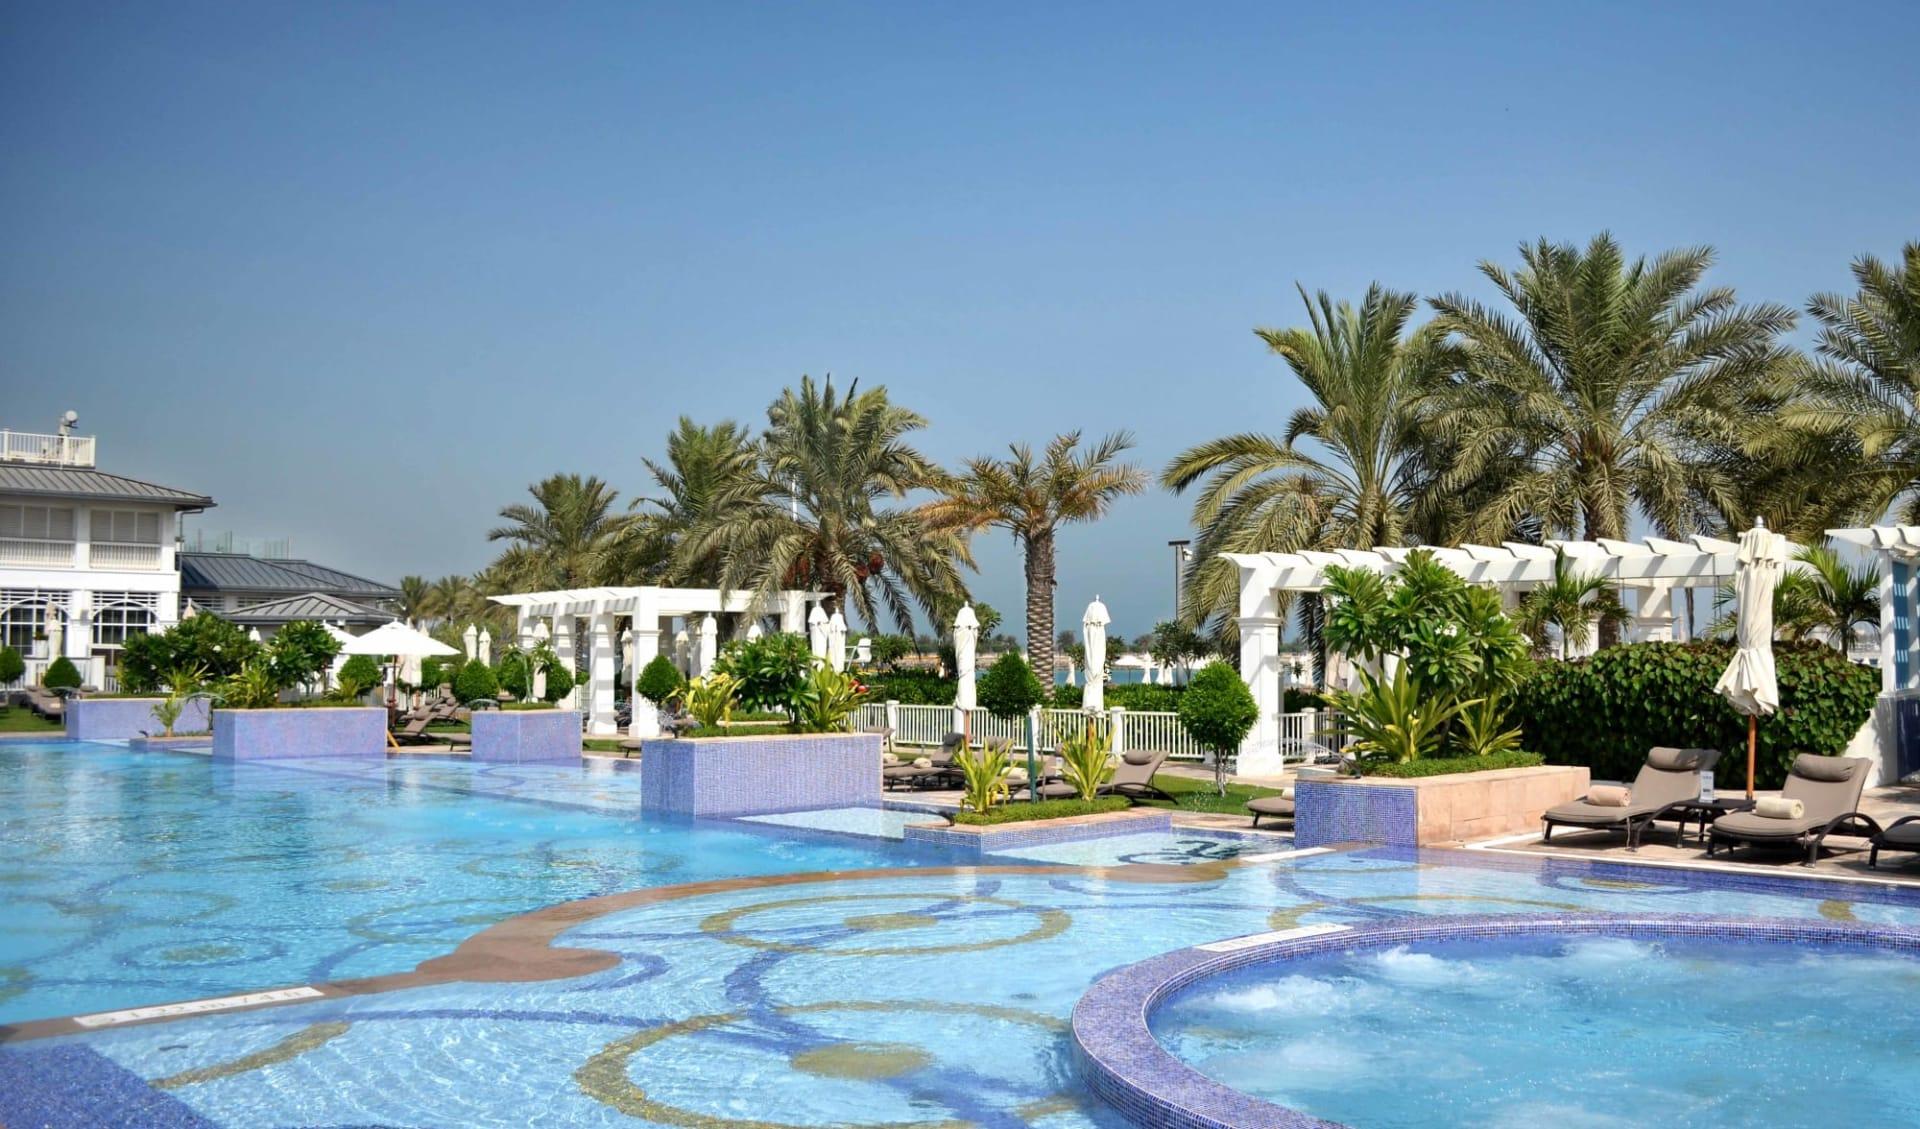 The St. Regis Abu Dhabi: